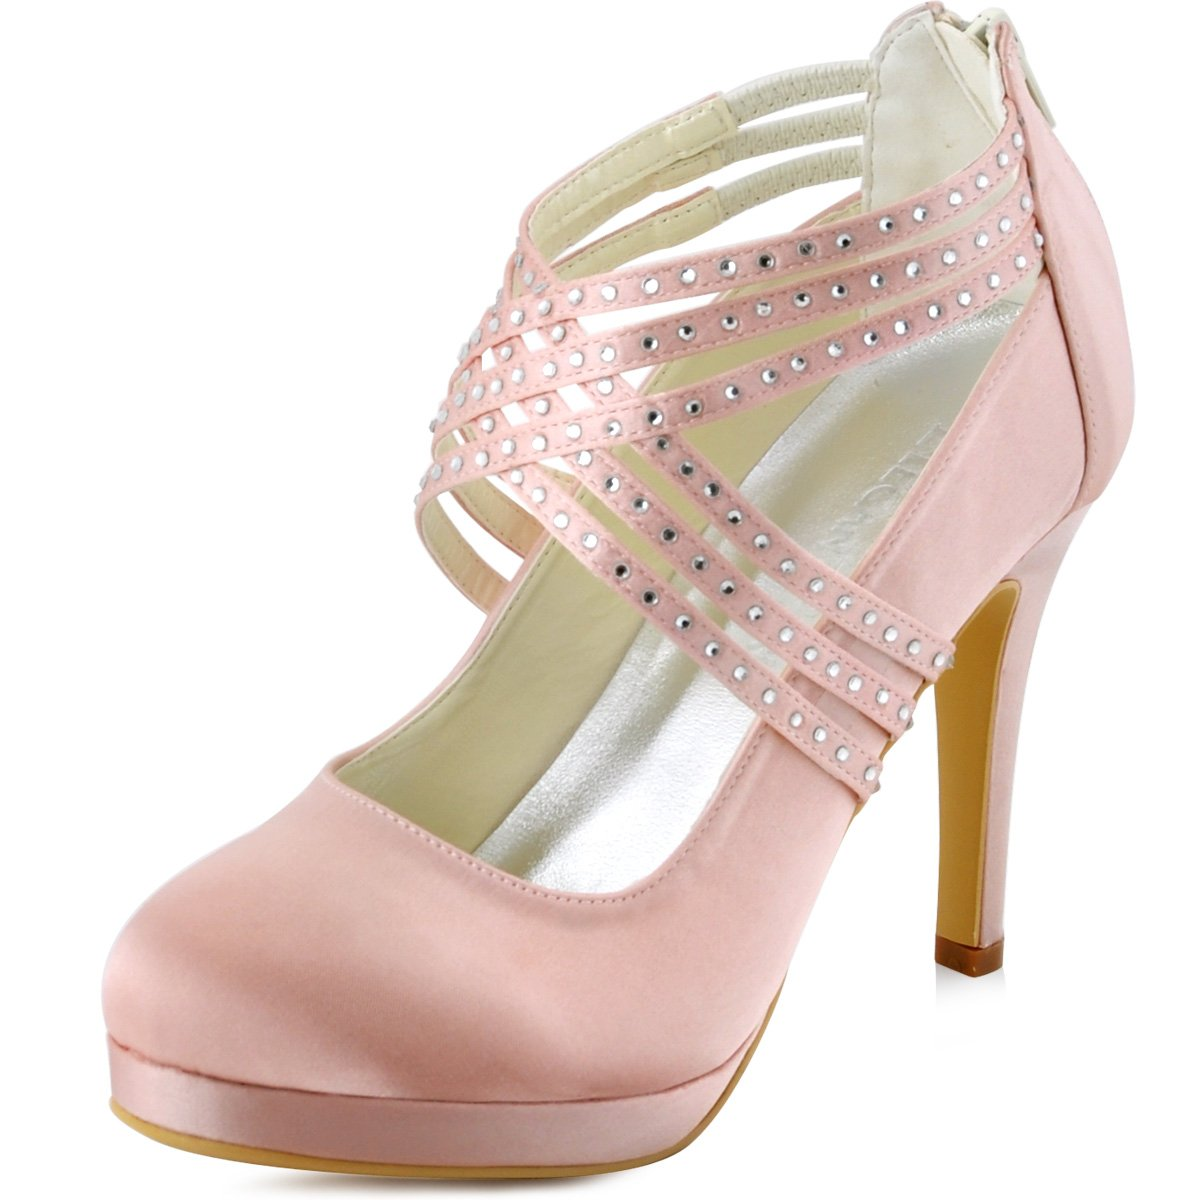 4059032d514136 ElegantPark Women High Heel Pumps Closed Closed Closed Toe Platform Strappy  Satin Evening Prom Dress Wedding ...